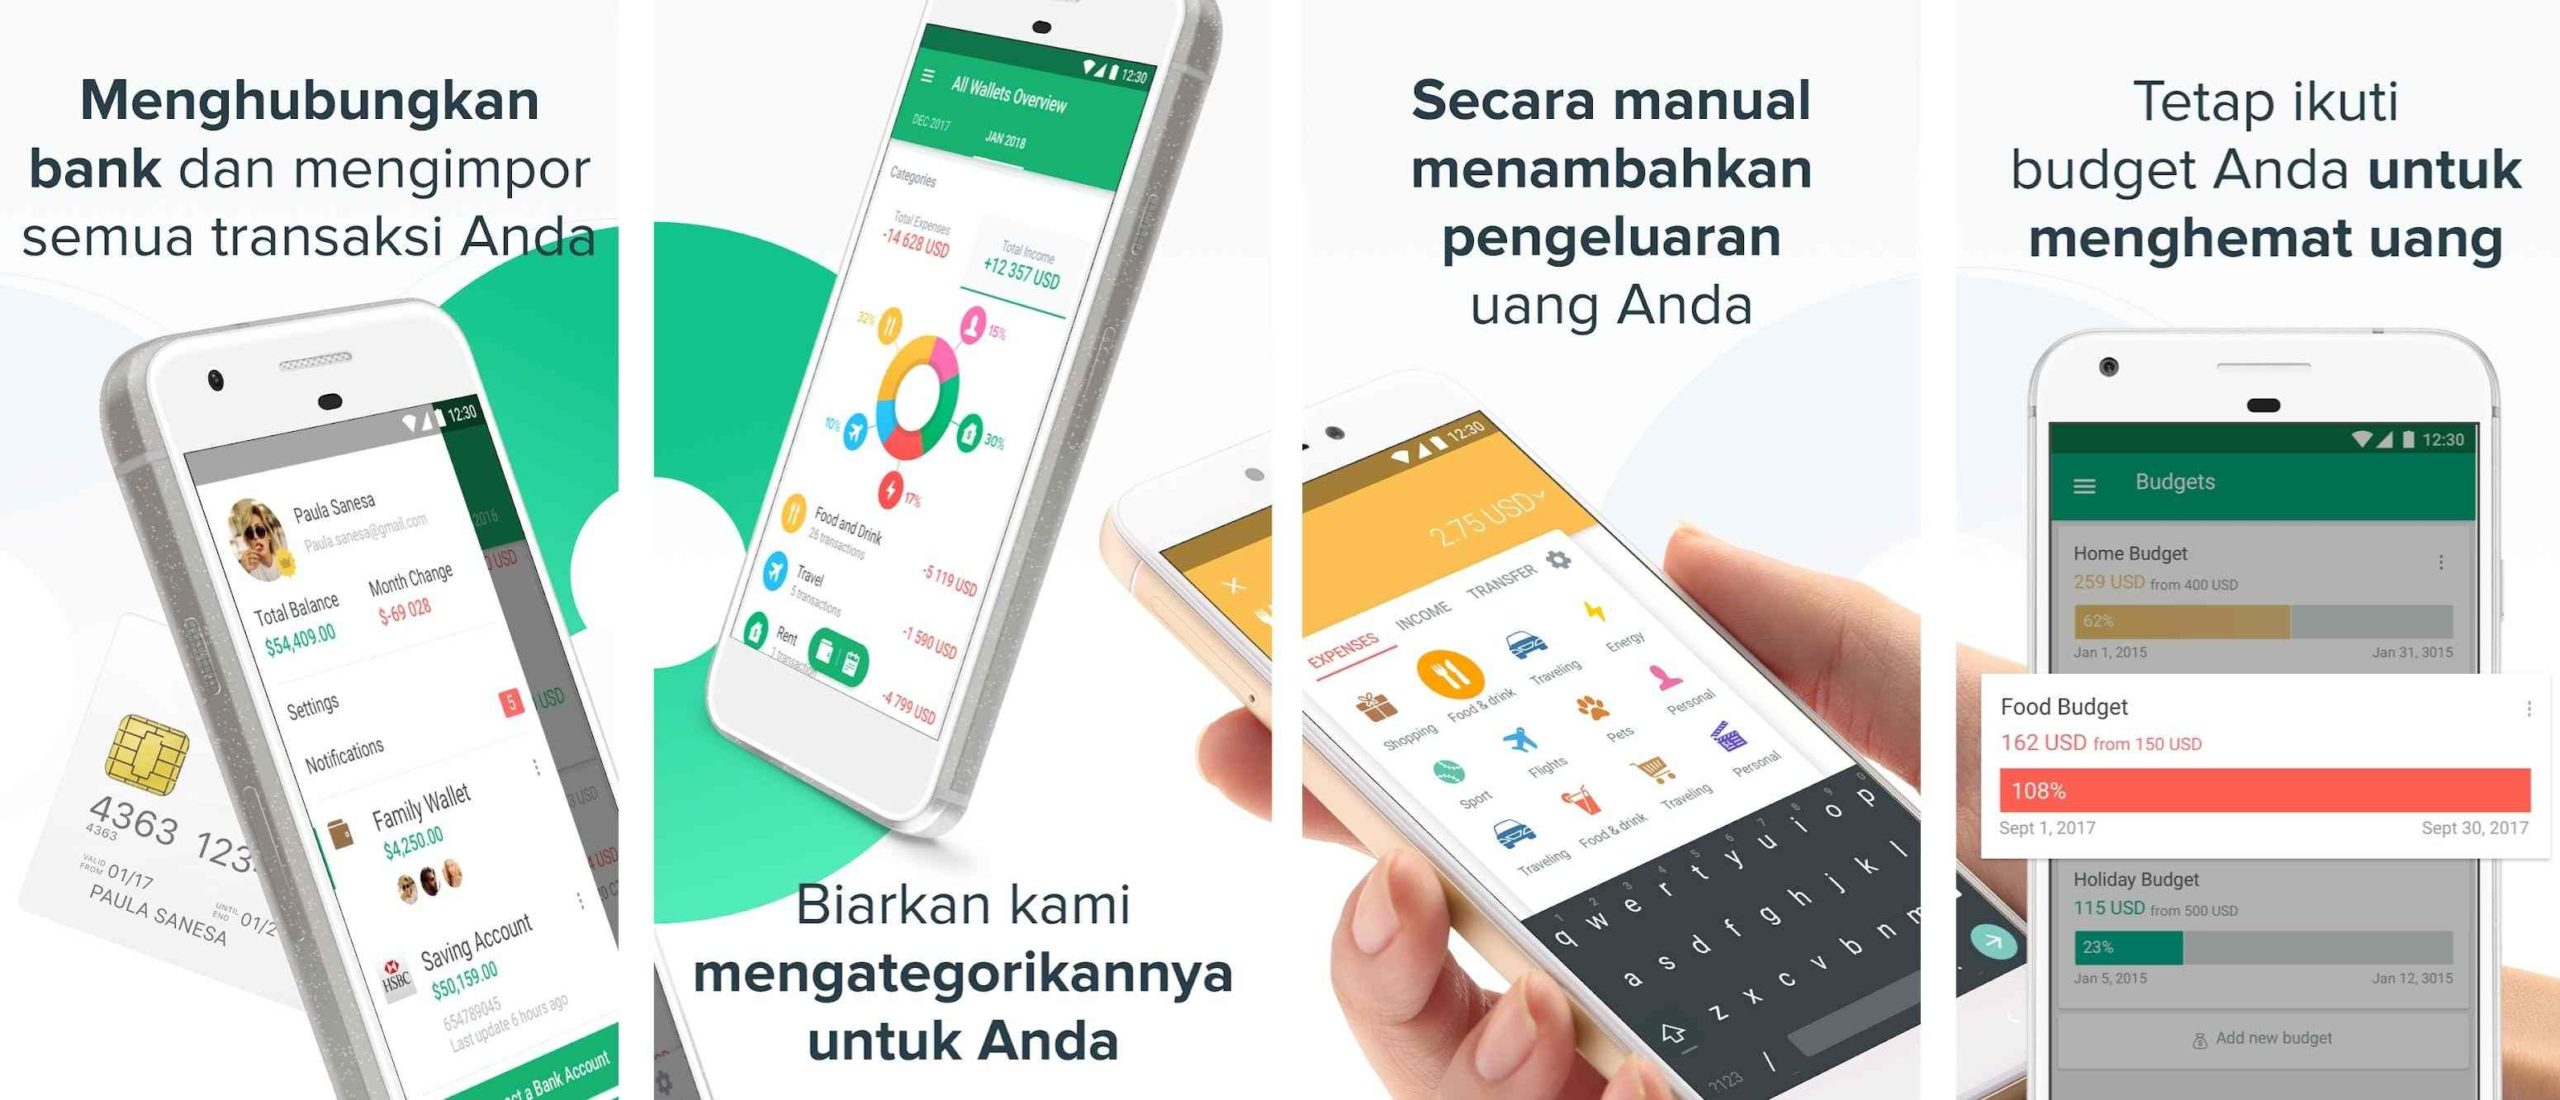 aplikasi pengatur keuangan spendee